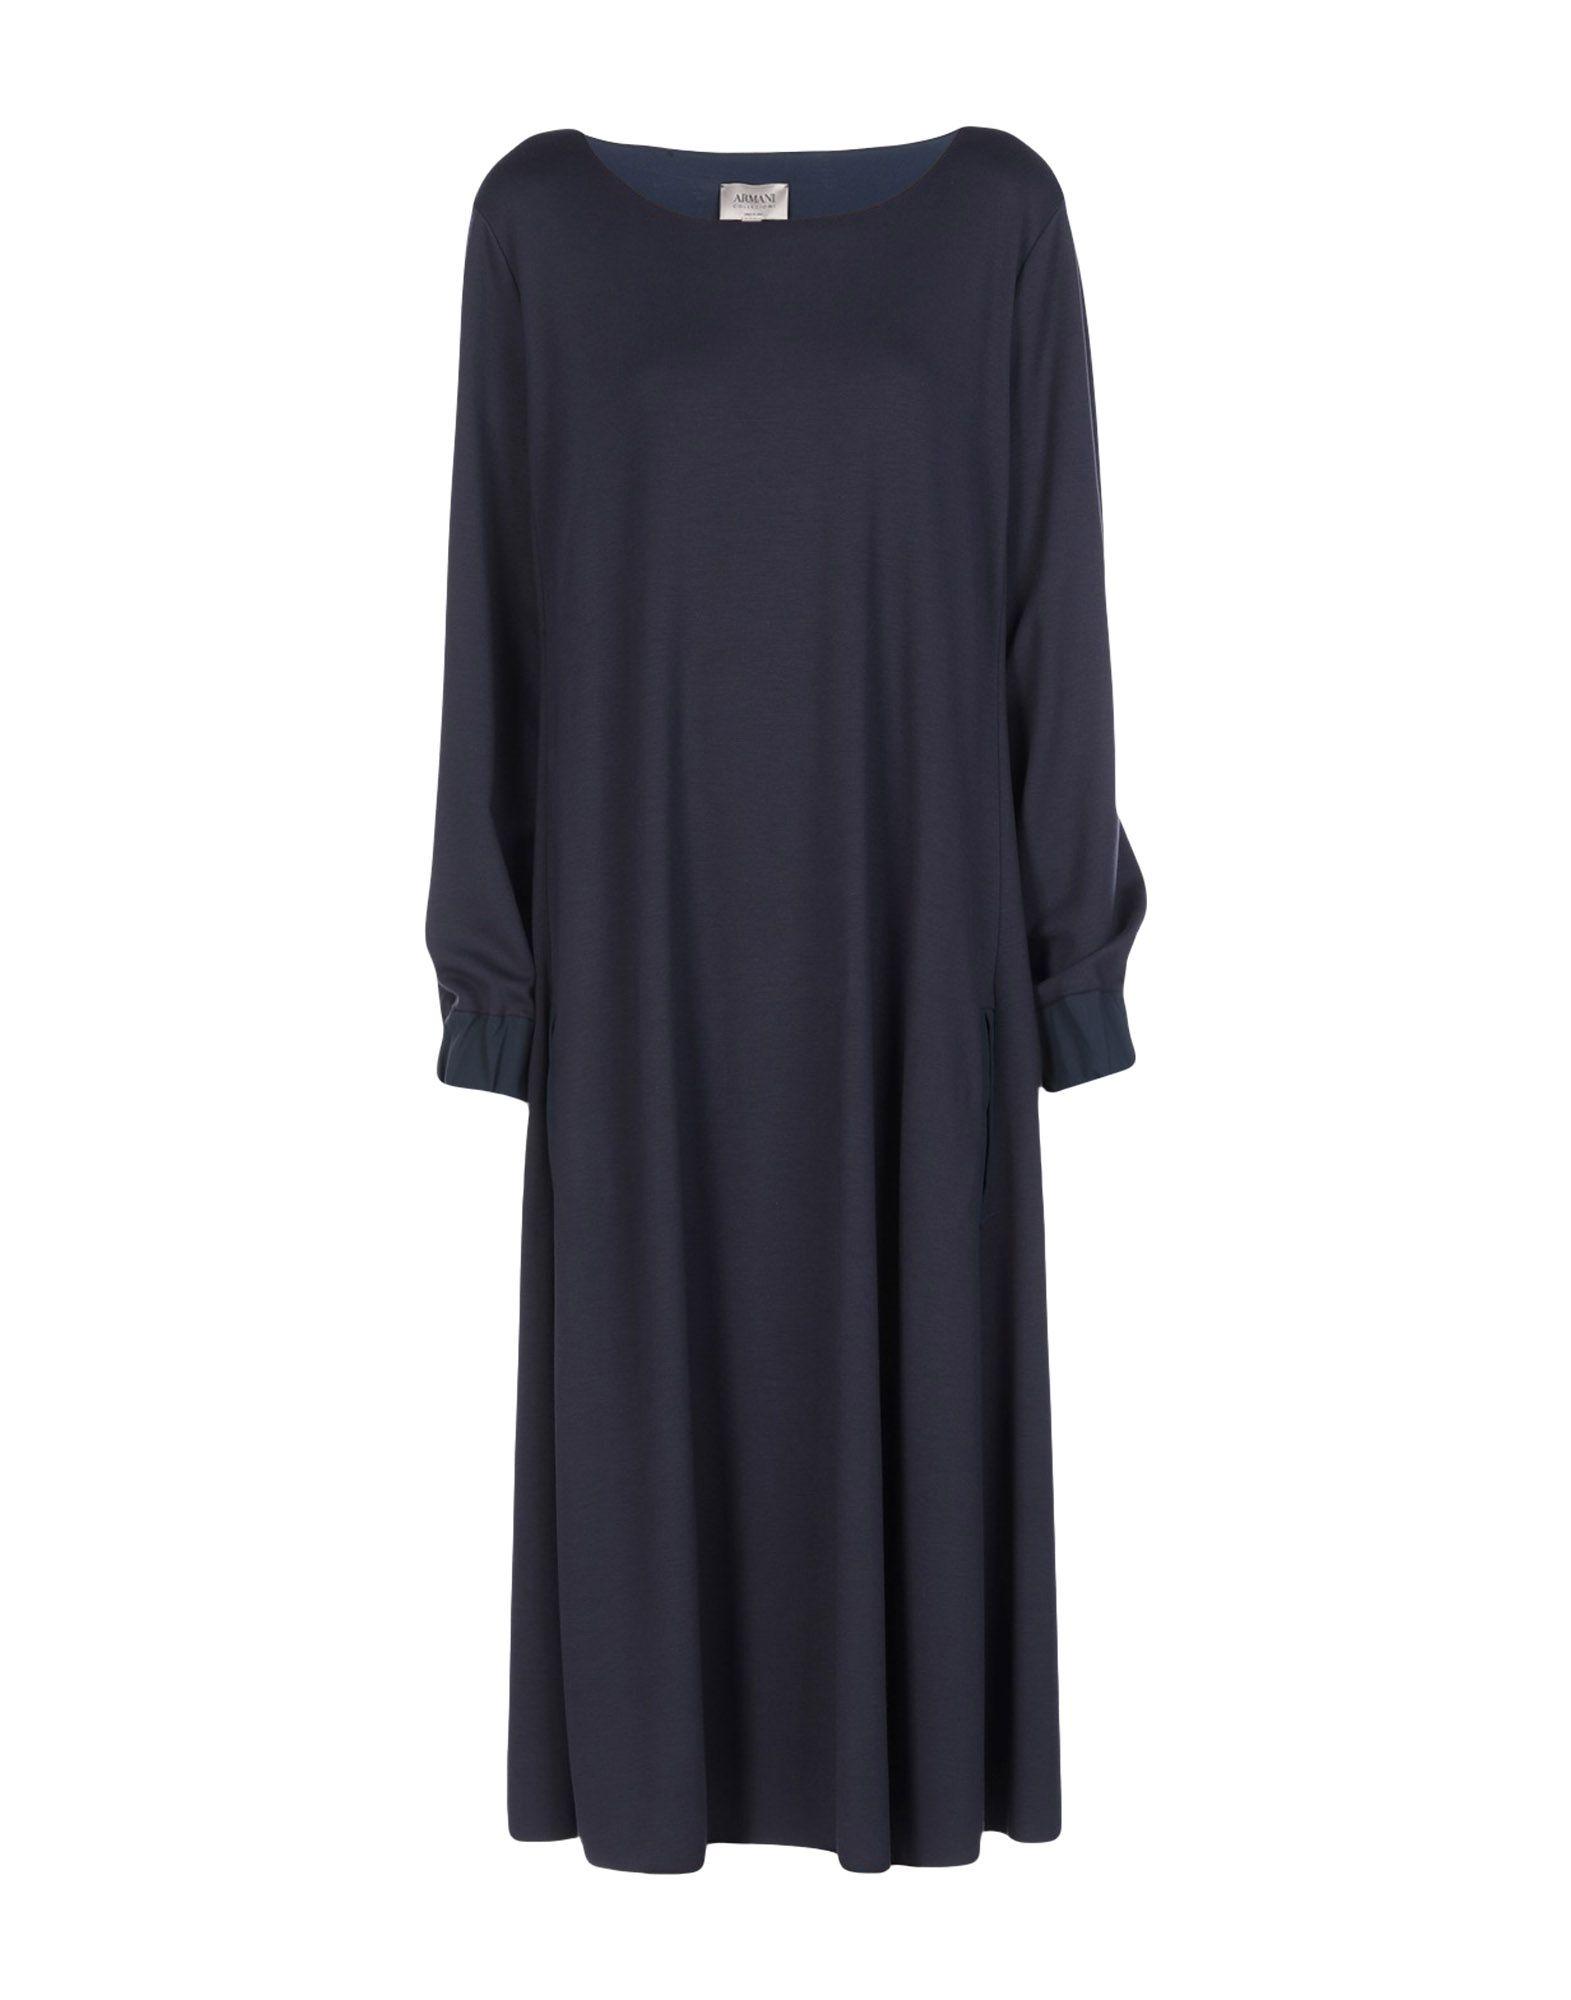 ARMANI COLLEZIONI Платье длиной 3/4 topshop платье длиной 3 4